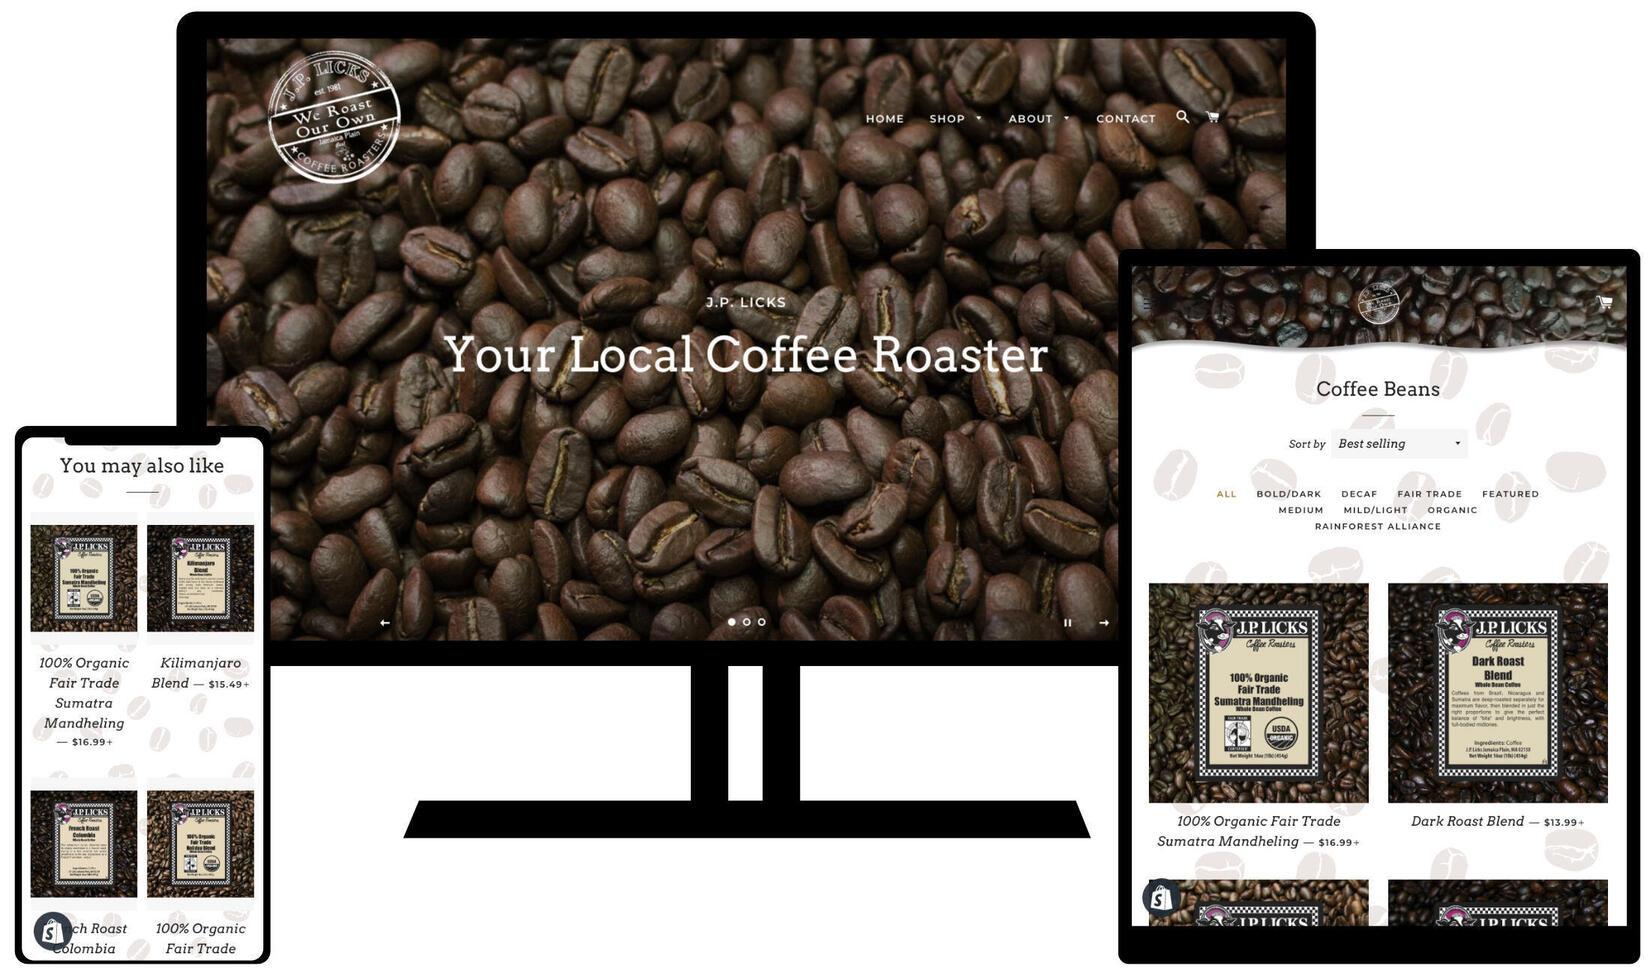 desktop, mobile, tablet views of jplickscoffee.com